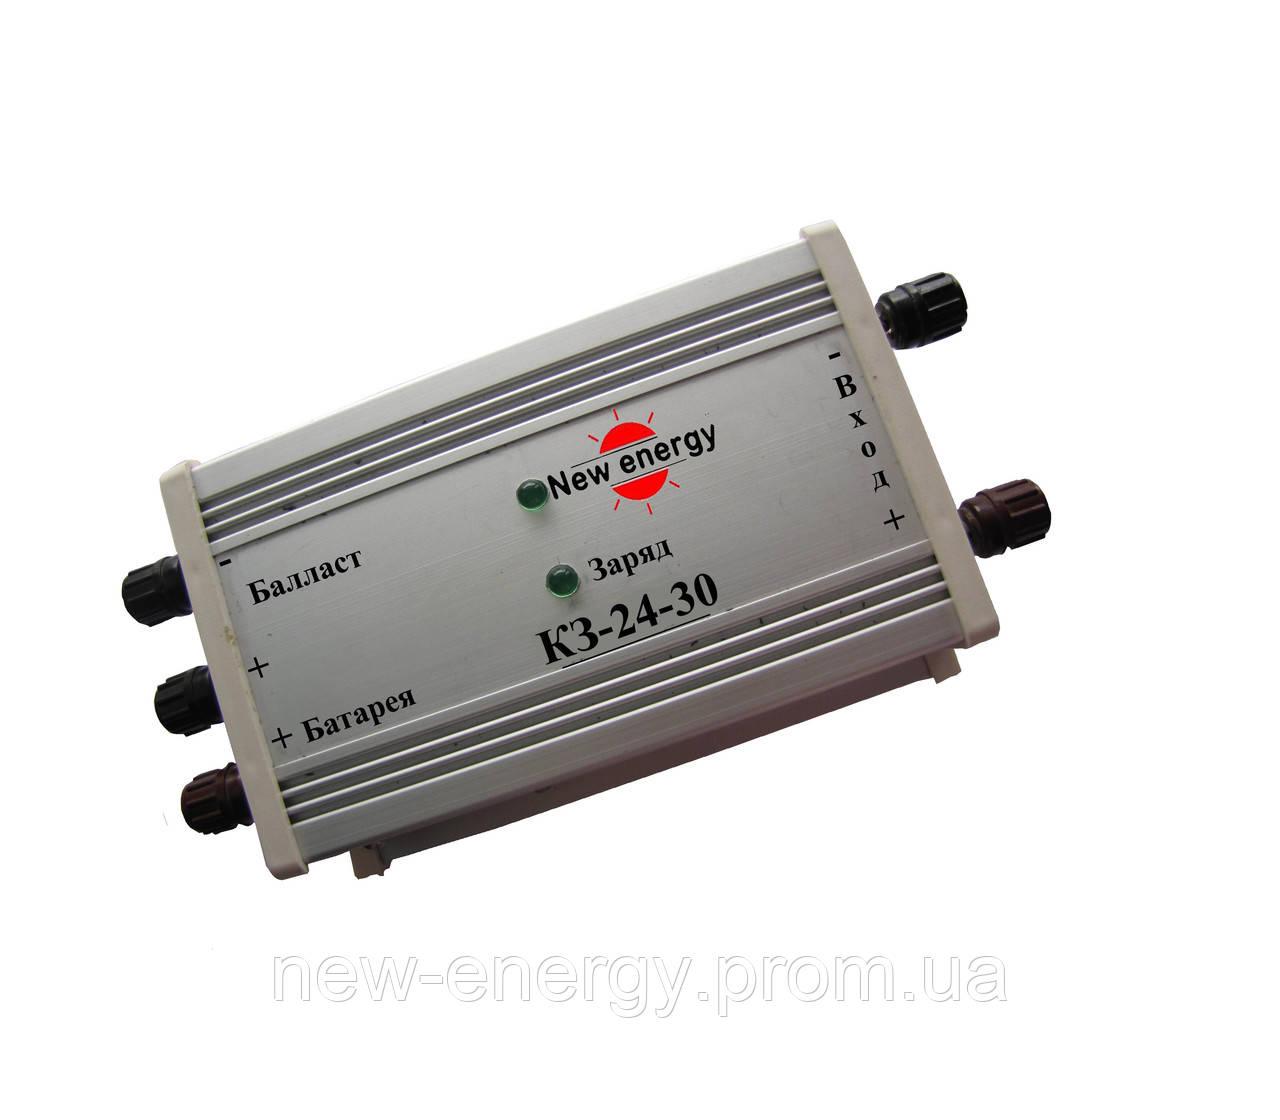 схема ветрогенератора и контроллера